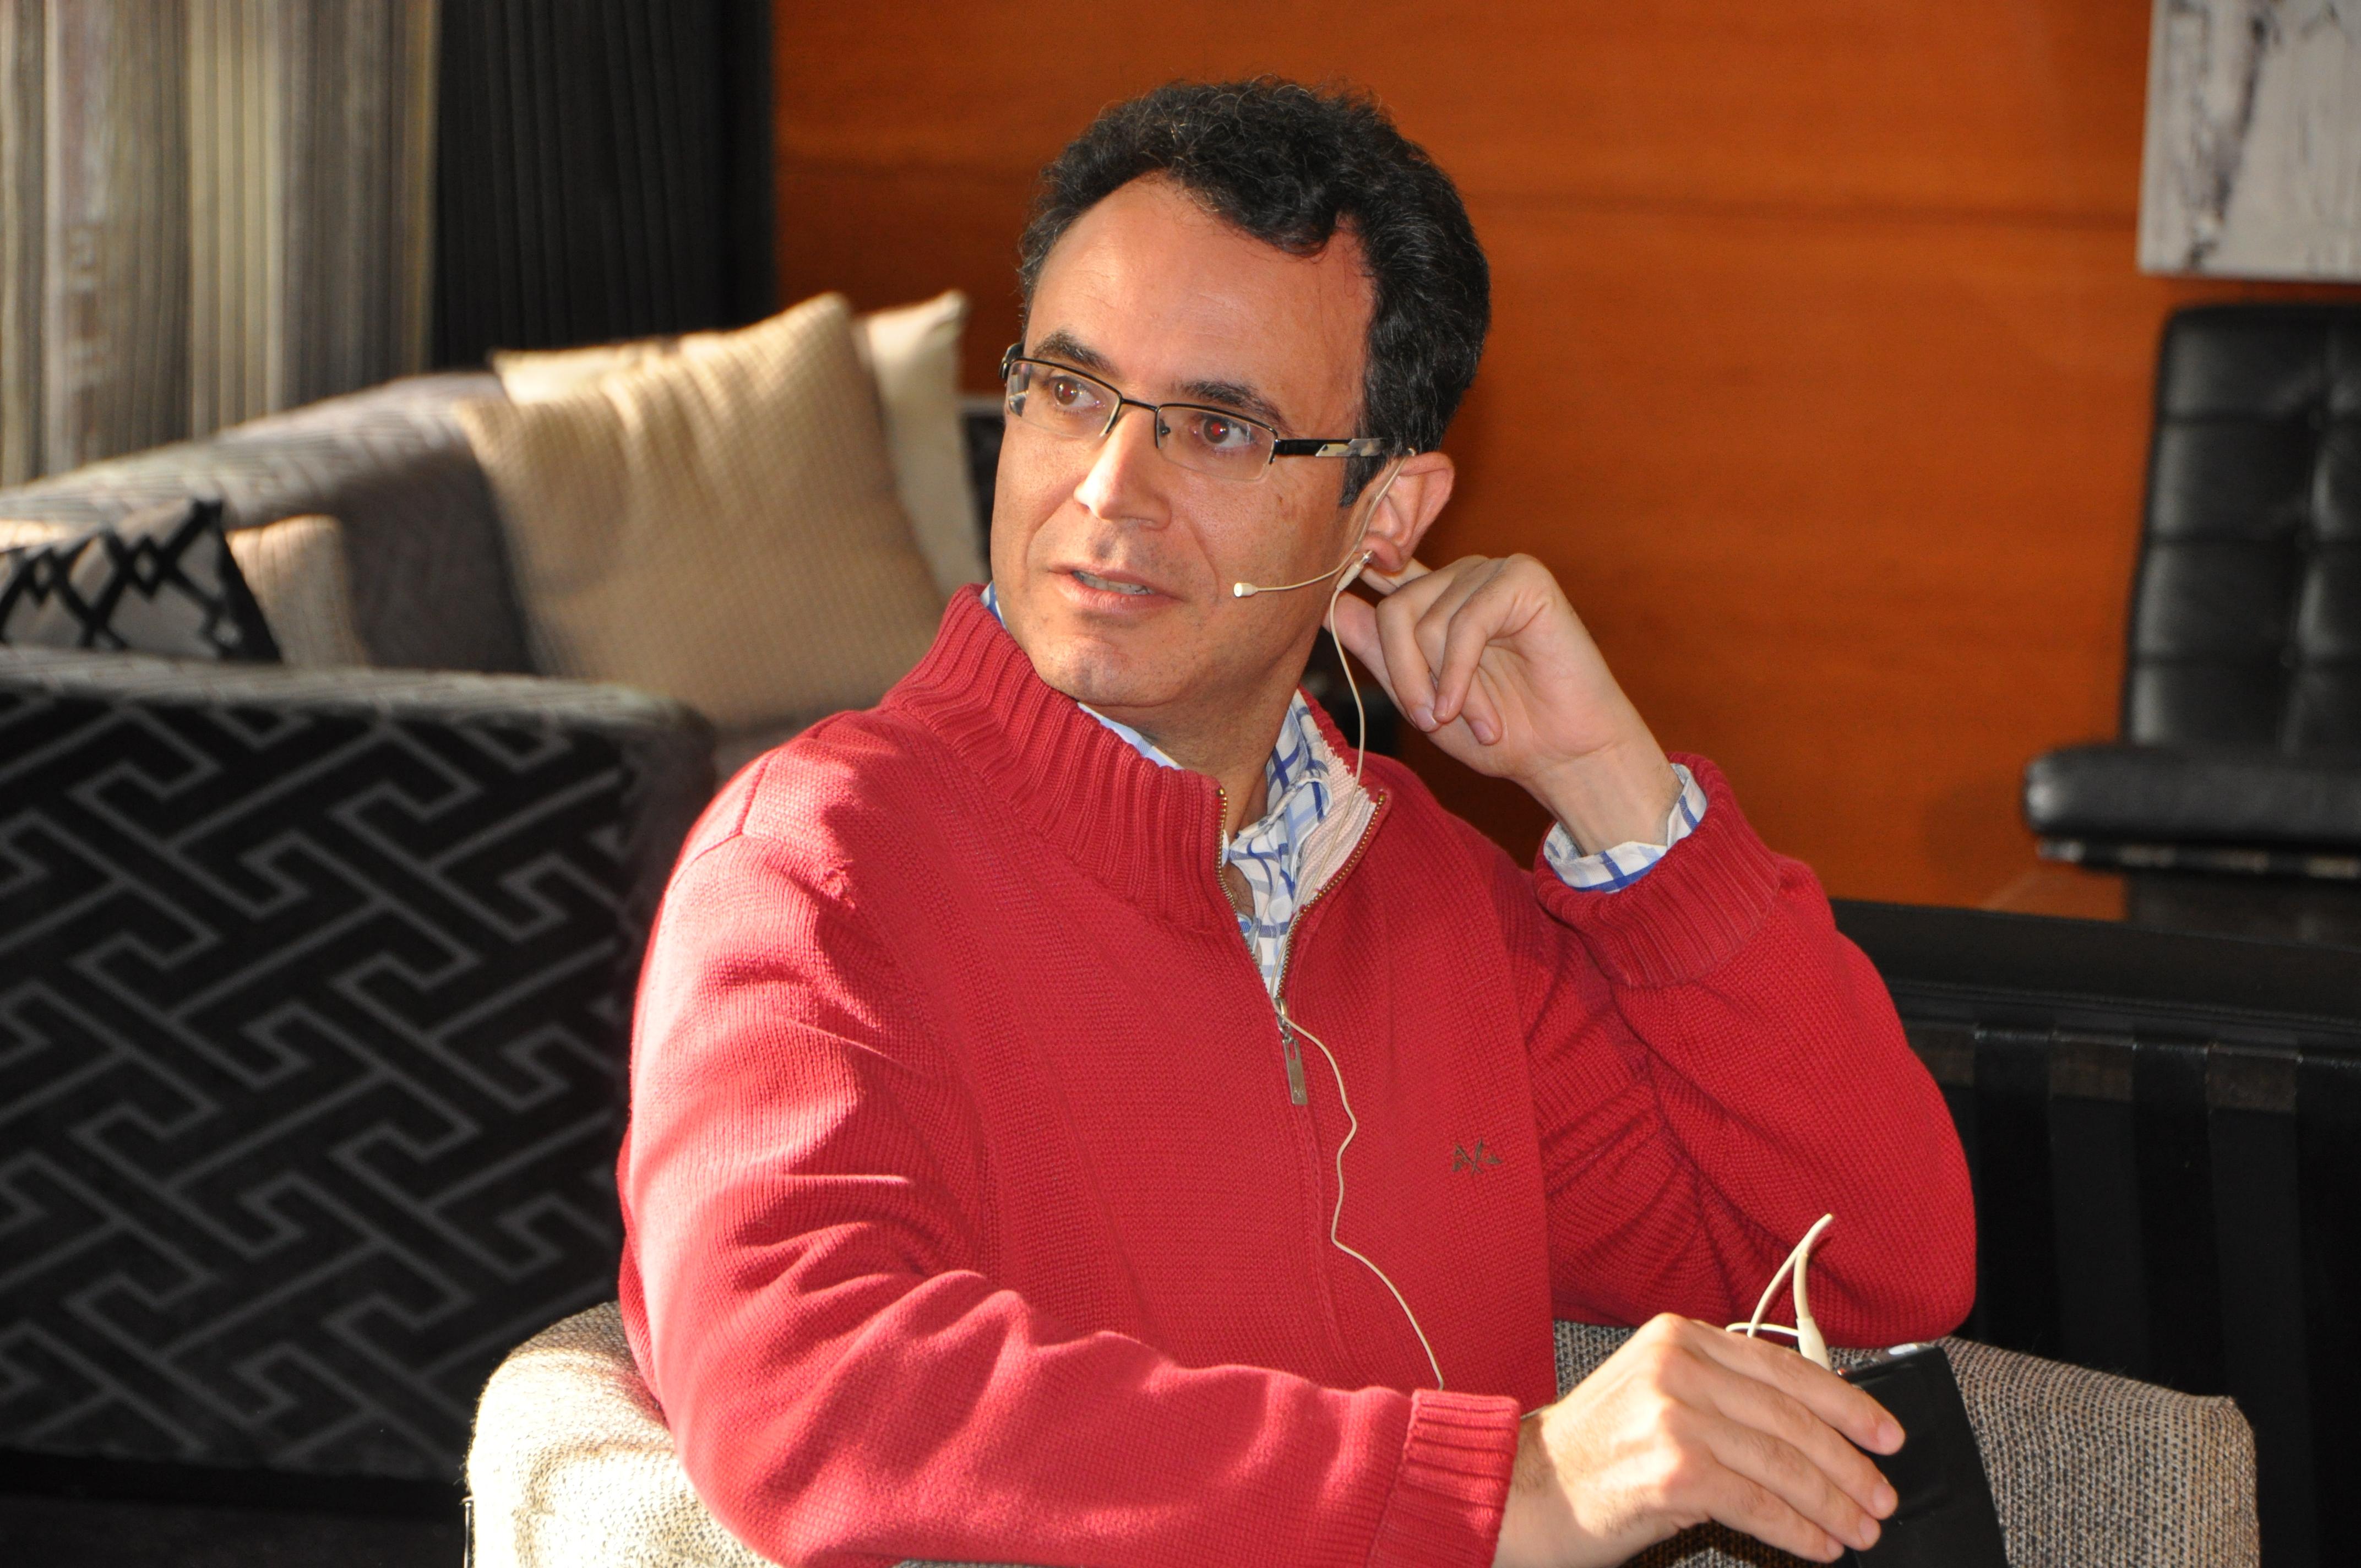 Rafael Jurado, escritor. Entrevistas. Cuentos ilustrados, novela, literatura, Coín, Málaga